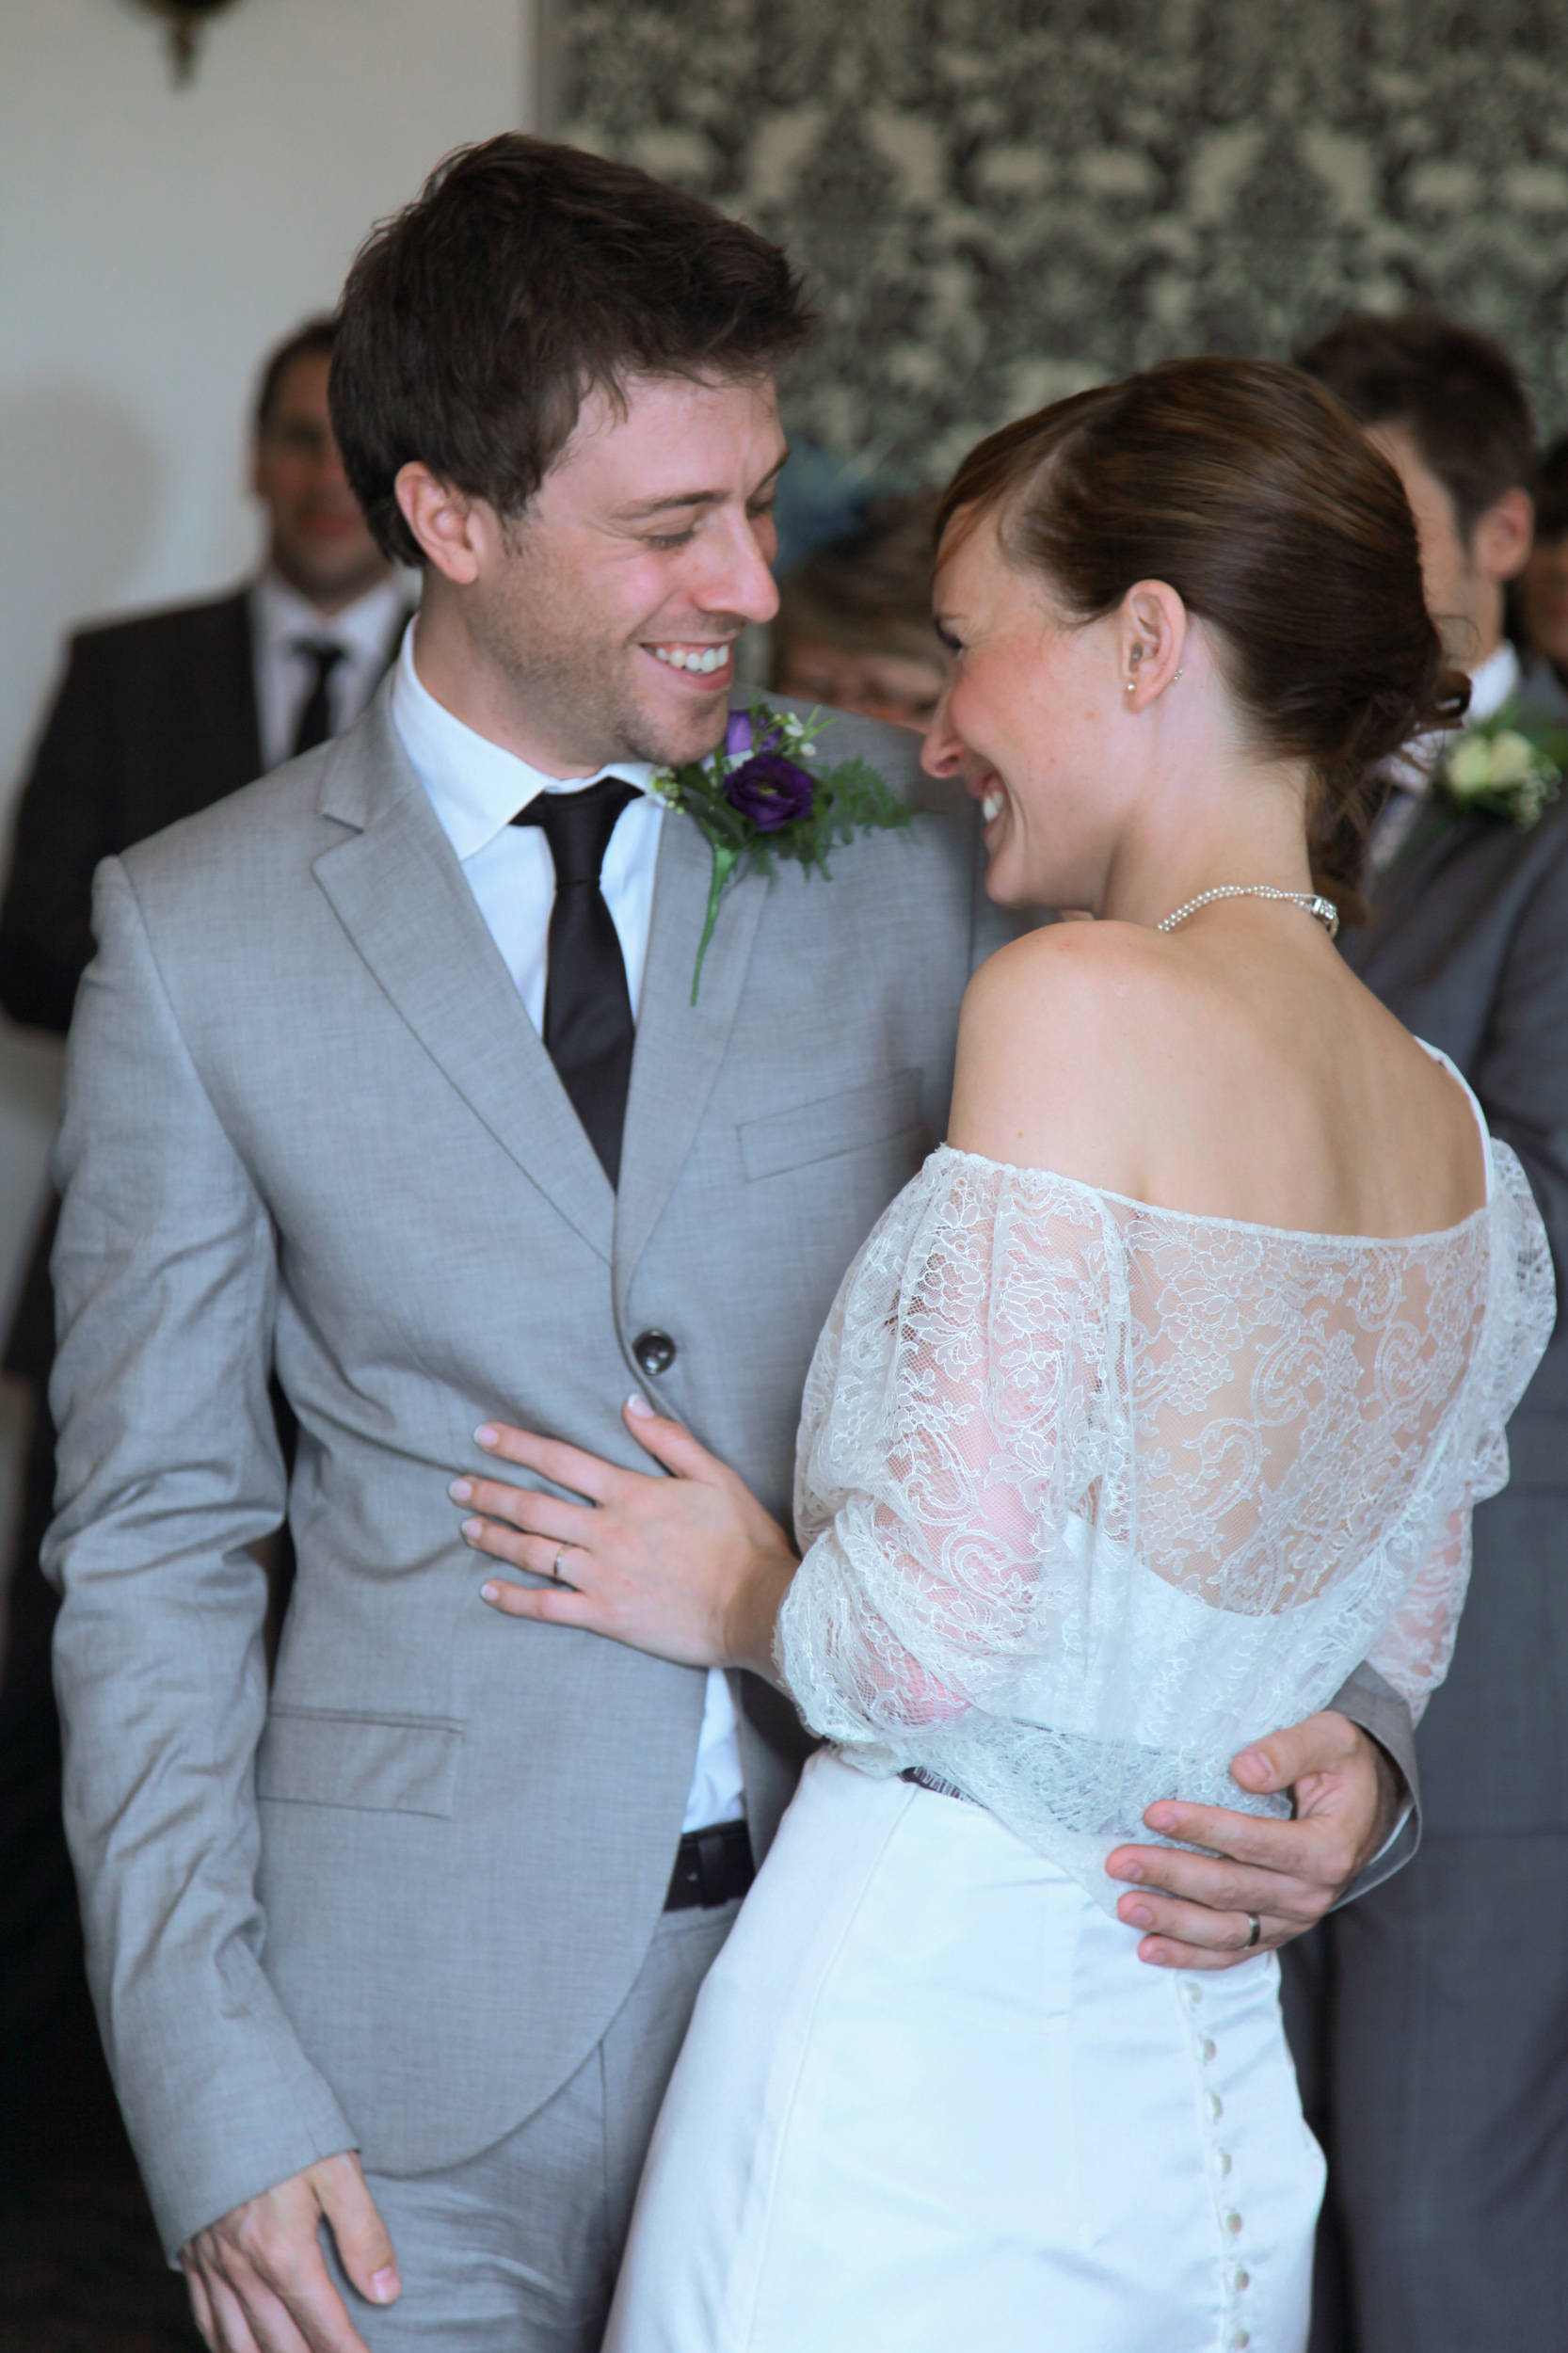 Alexandra-bespoke-wedding-dress-Kate-Beaumont-8.jpg